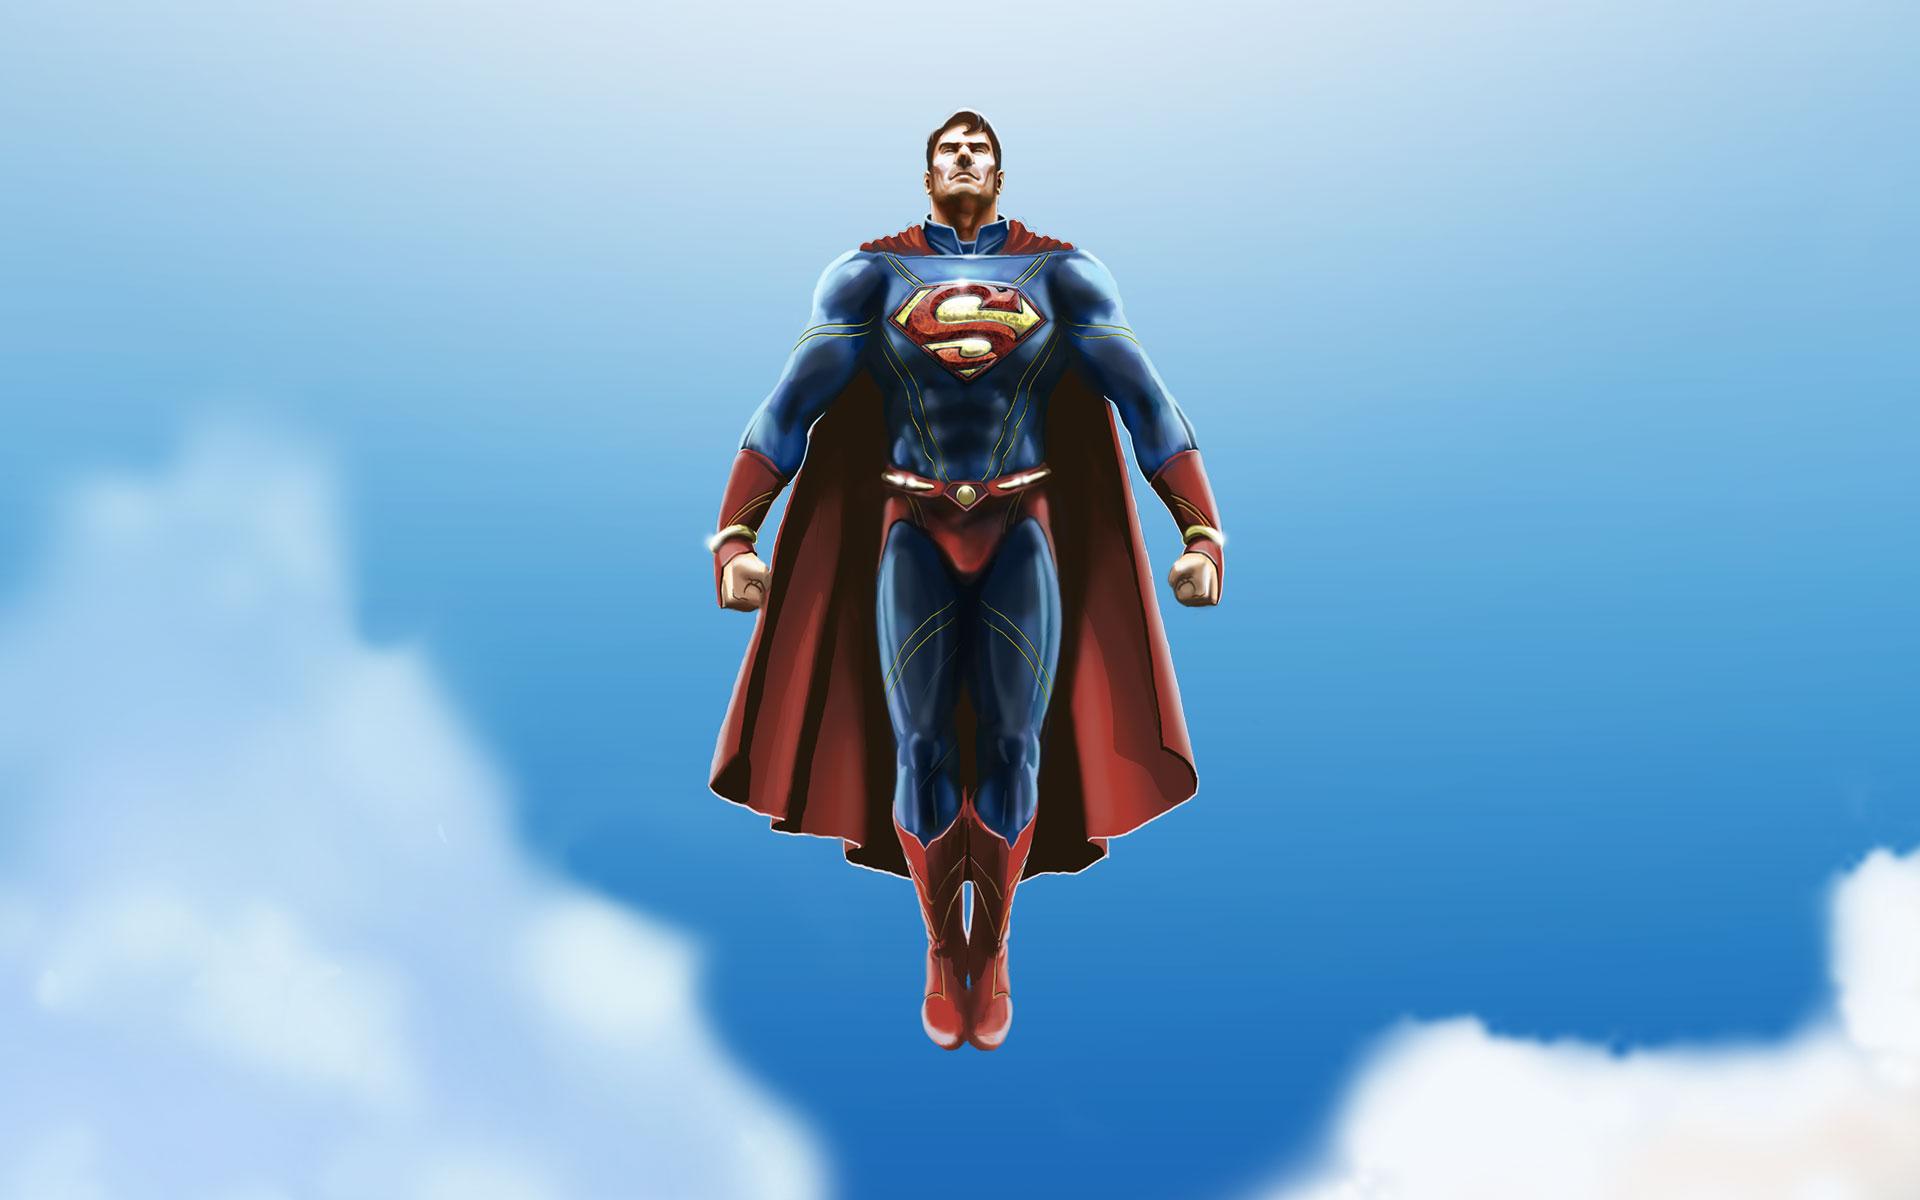 Superman Cartoon Wallpaper Mobile ImageBankbiz 1920x1200